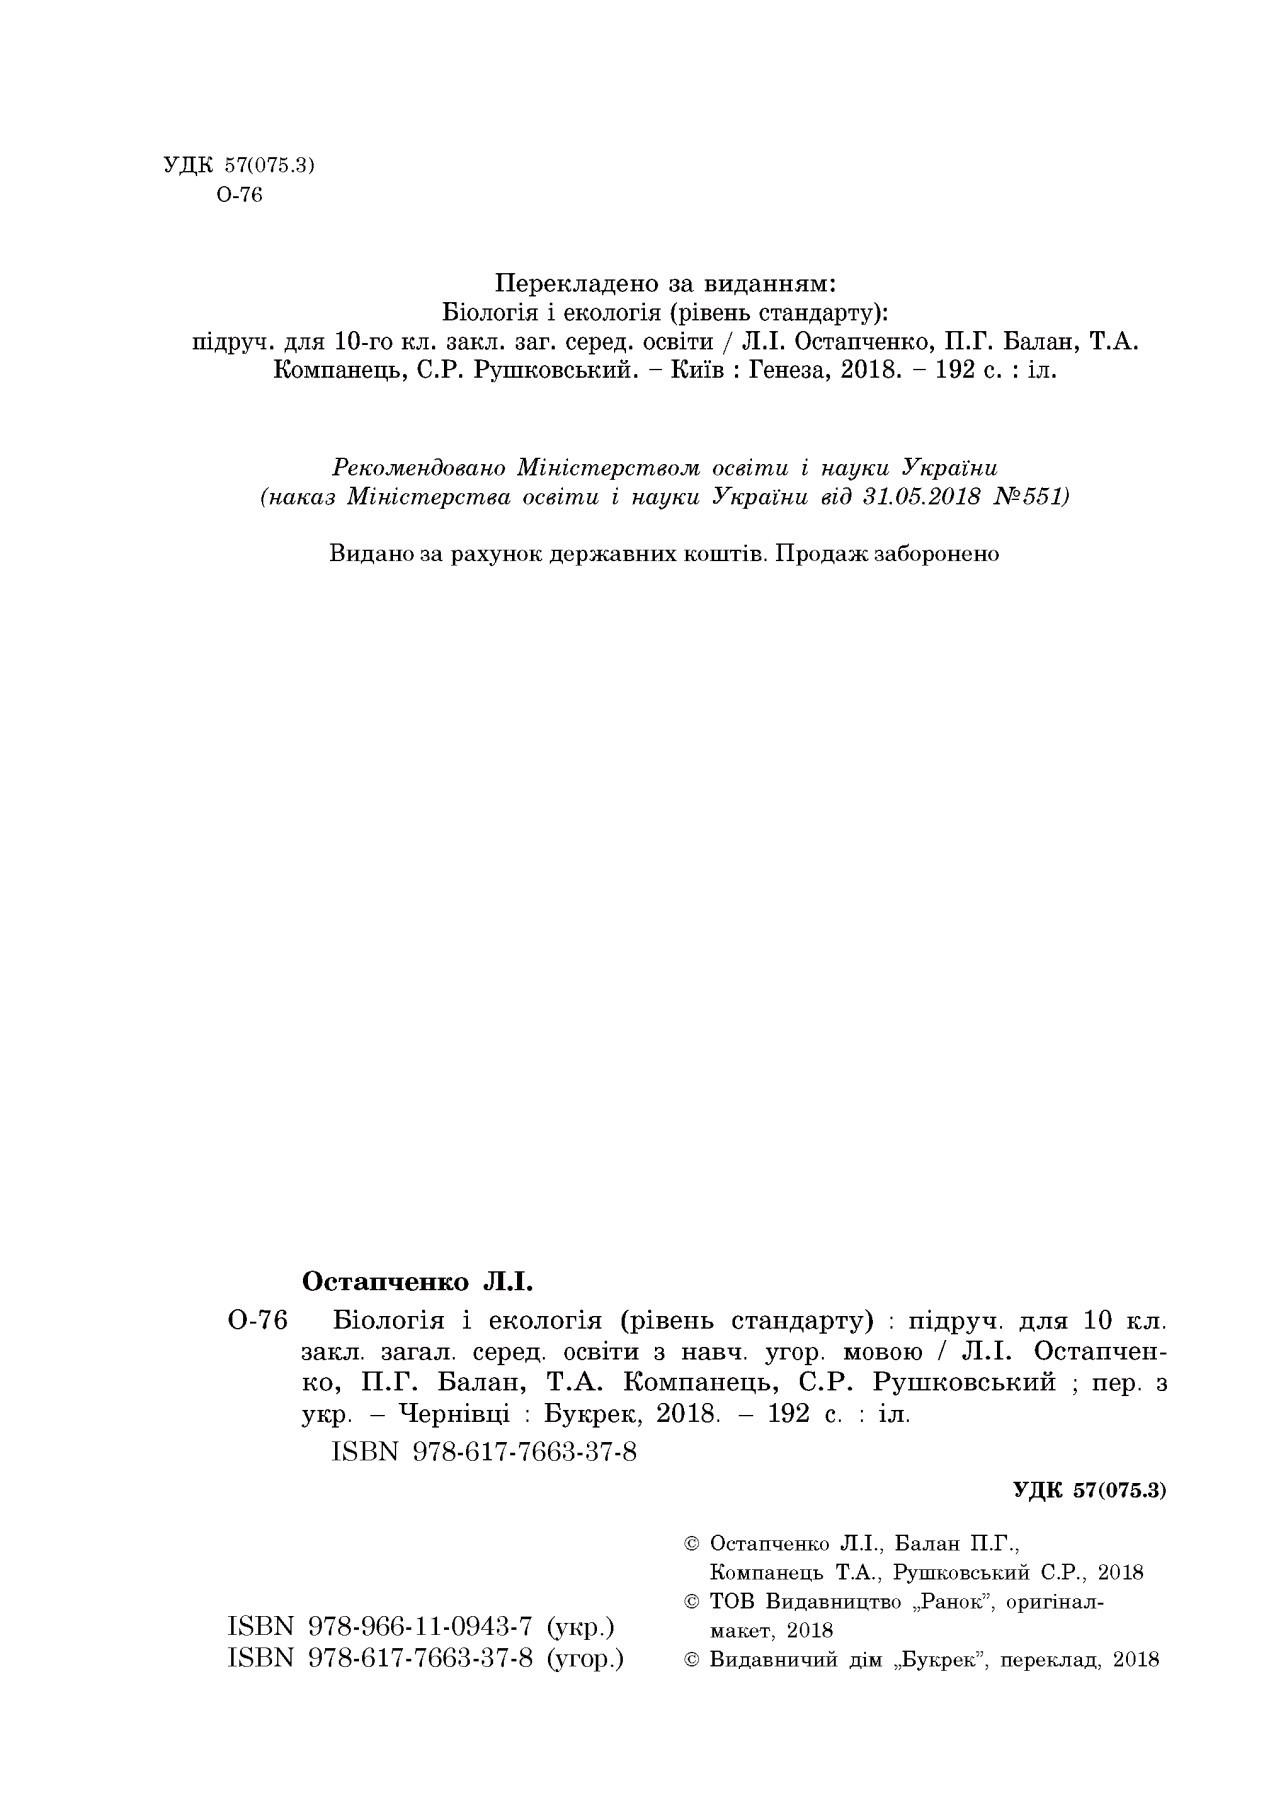 a betegség diphyllobothriasis jellege